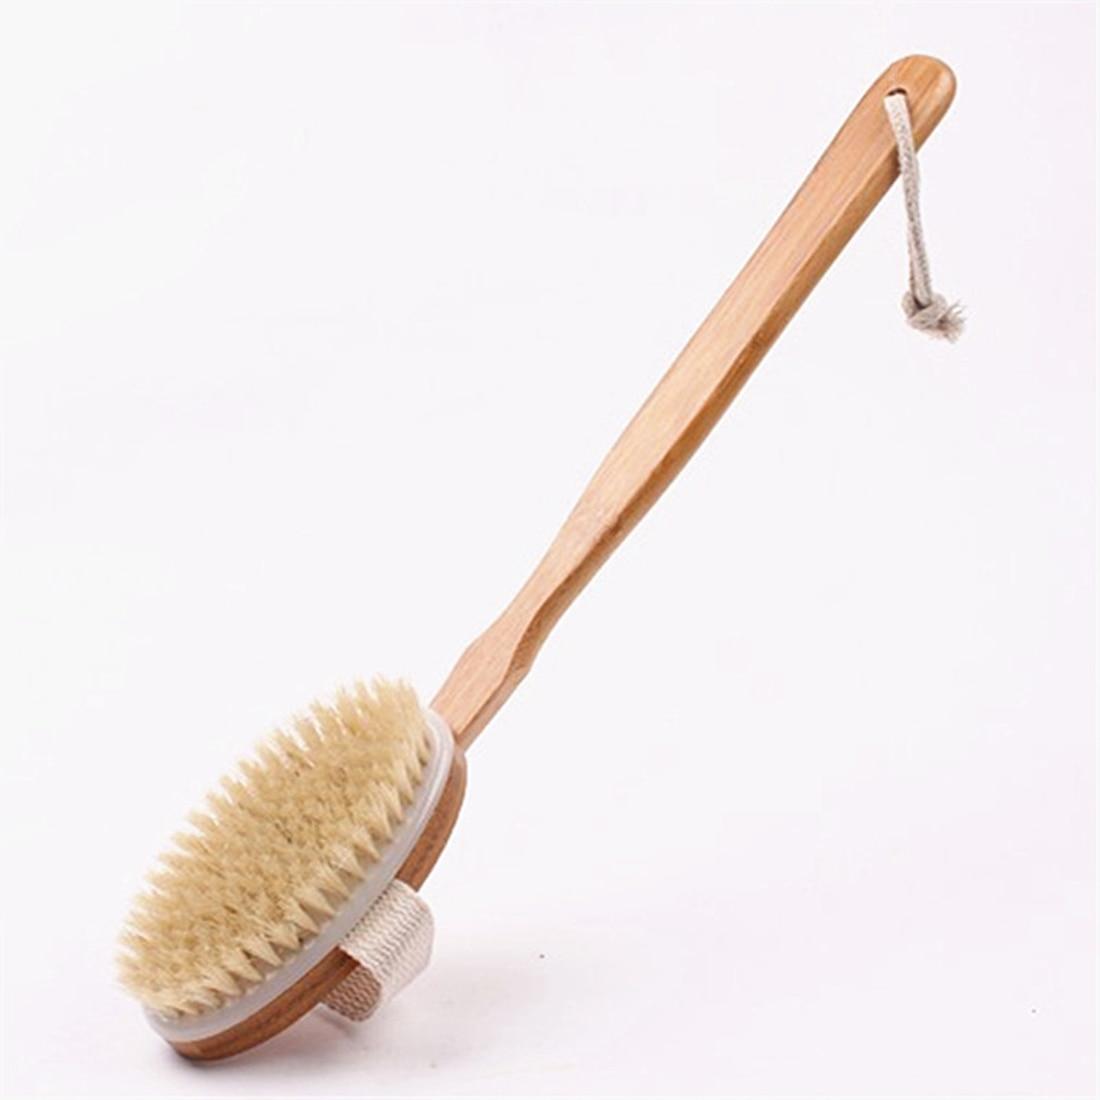 41cm Bath Brush For Back Bristles Scrubber Long Handle